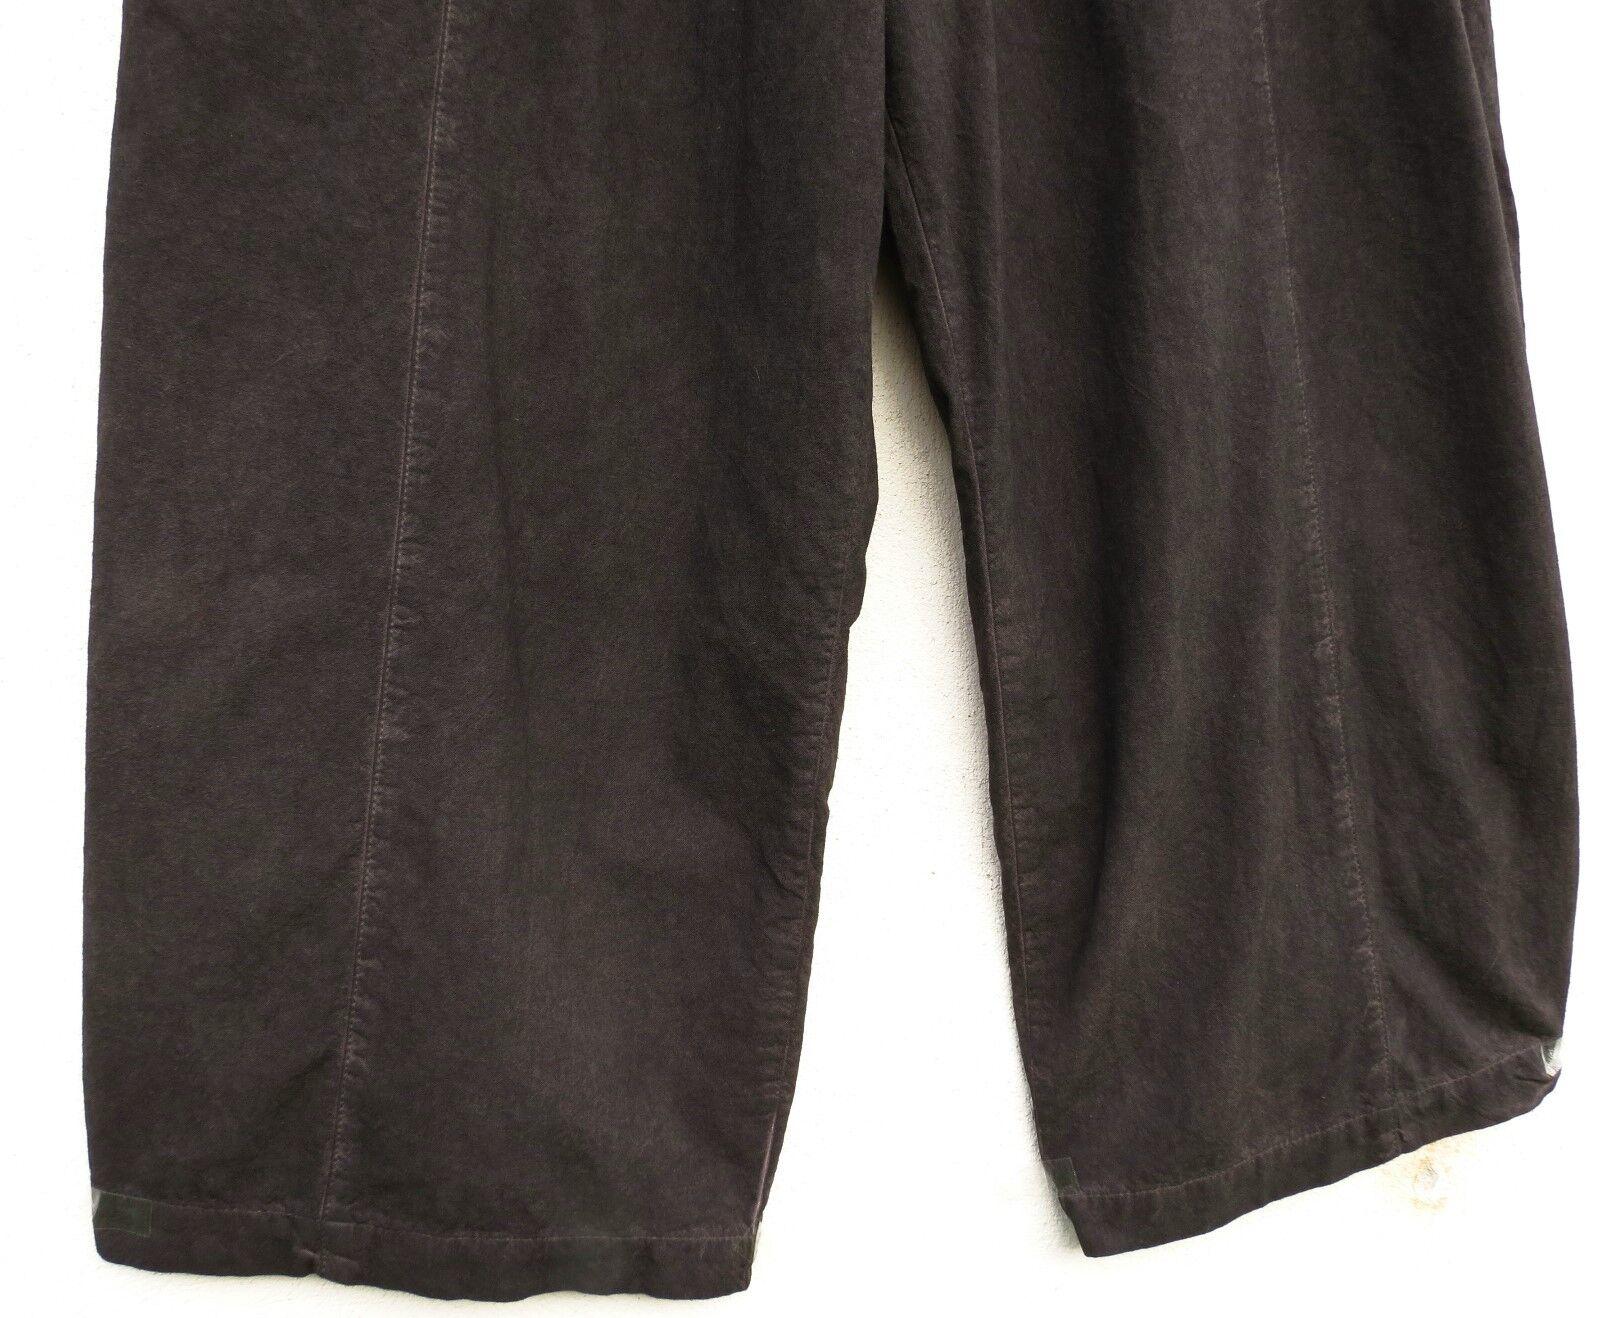 D 'Celli pantaloni trousers pantalon 10% LINO LINEN LINEN LINEN M 40 42 Lagenlook 32ecff